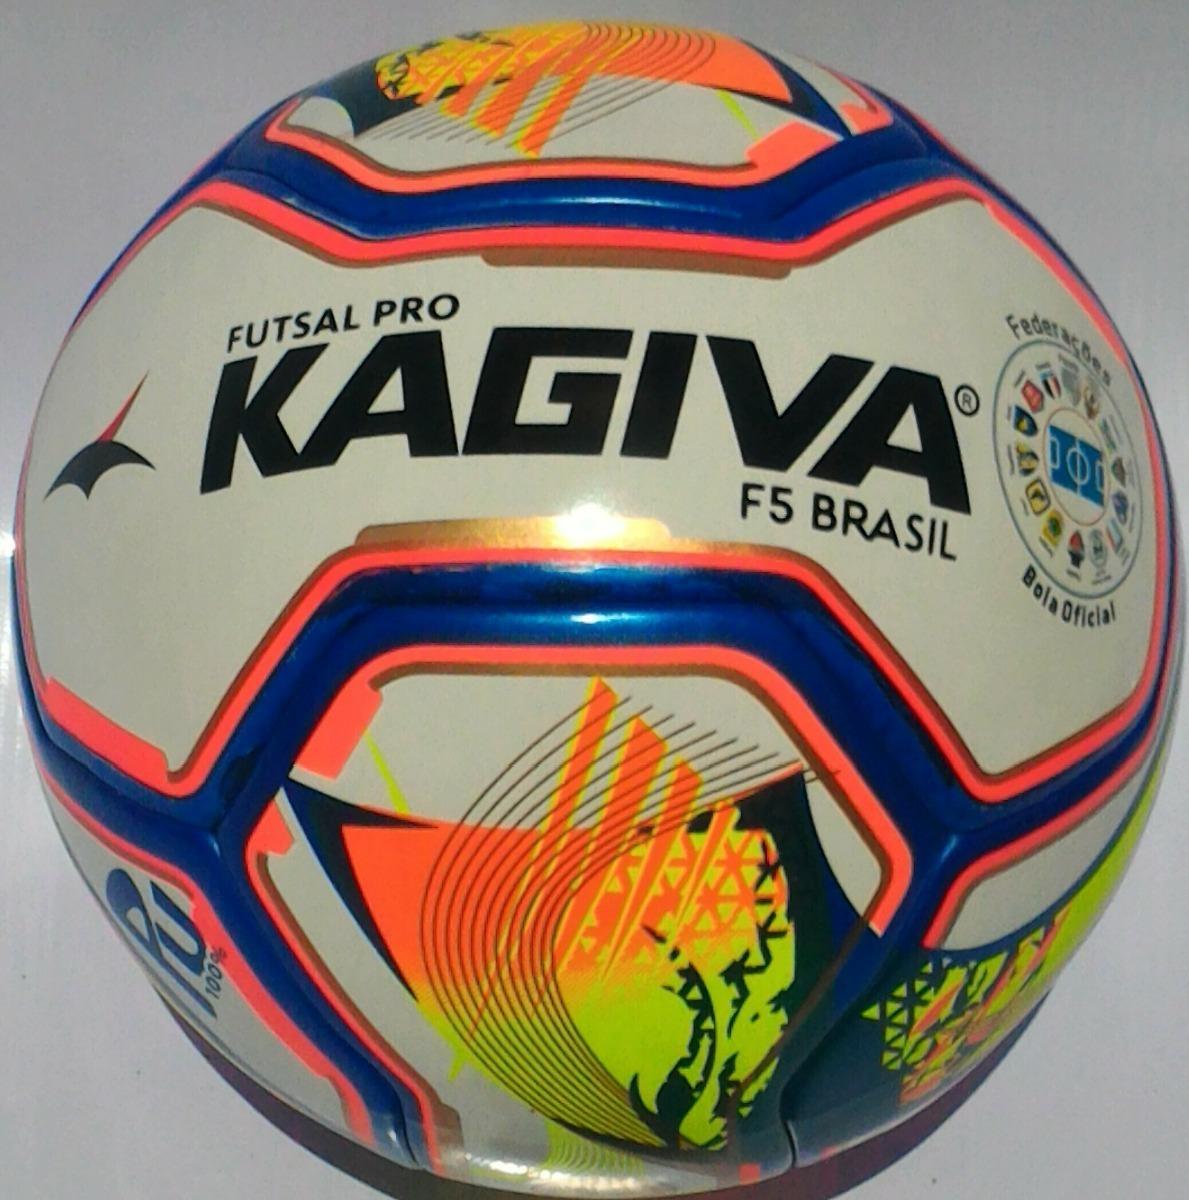 5bad5e4080aa1 2 bolas futsal kagiva f5 brasil pro oficial melhor preço. Carregando zoom.